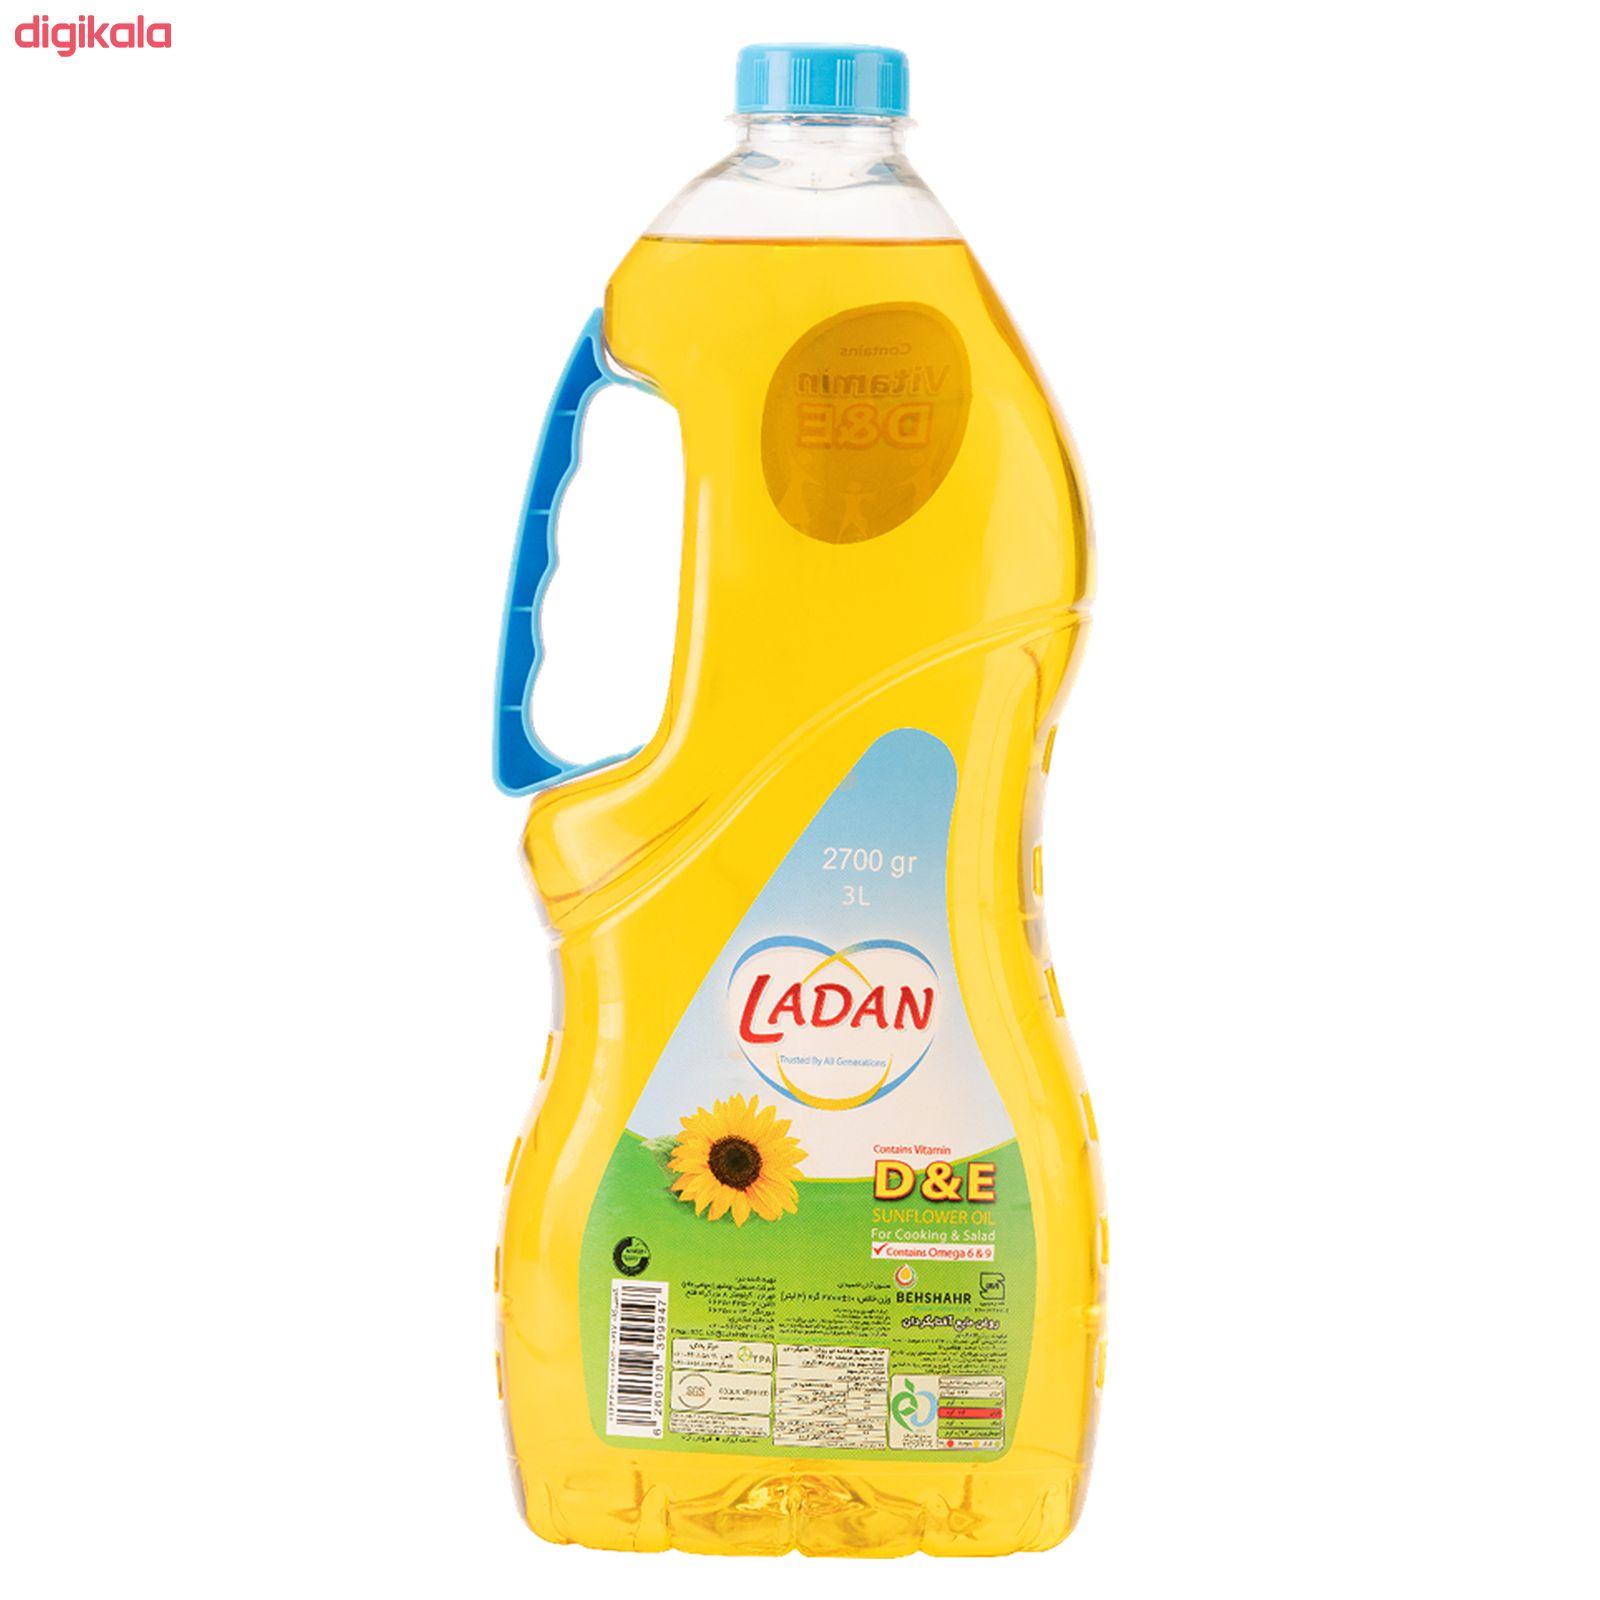 روغن مایع آفتابگردان حاوی ویتامین دی و ای لادن - 2.7  کیلوگرم main 1 4